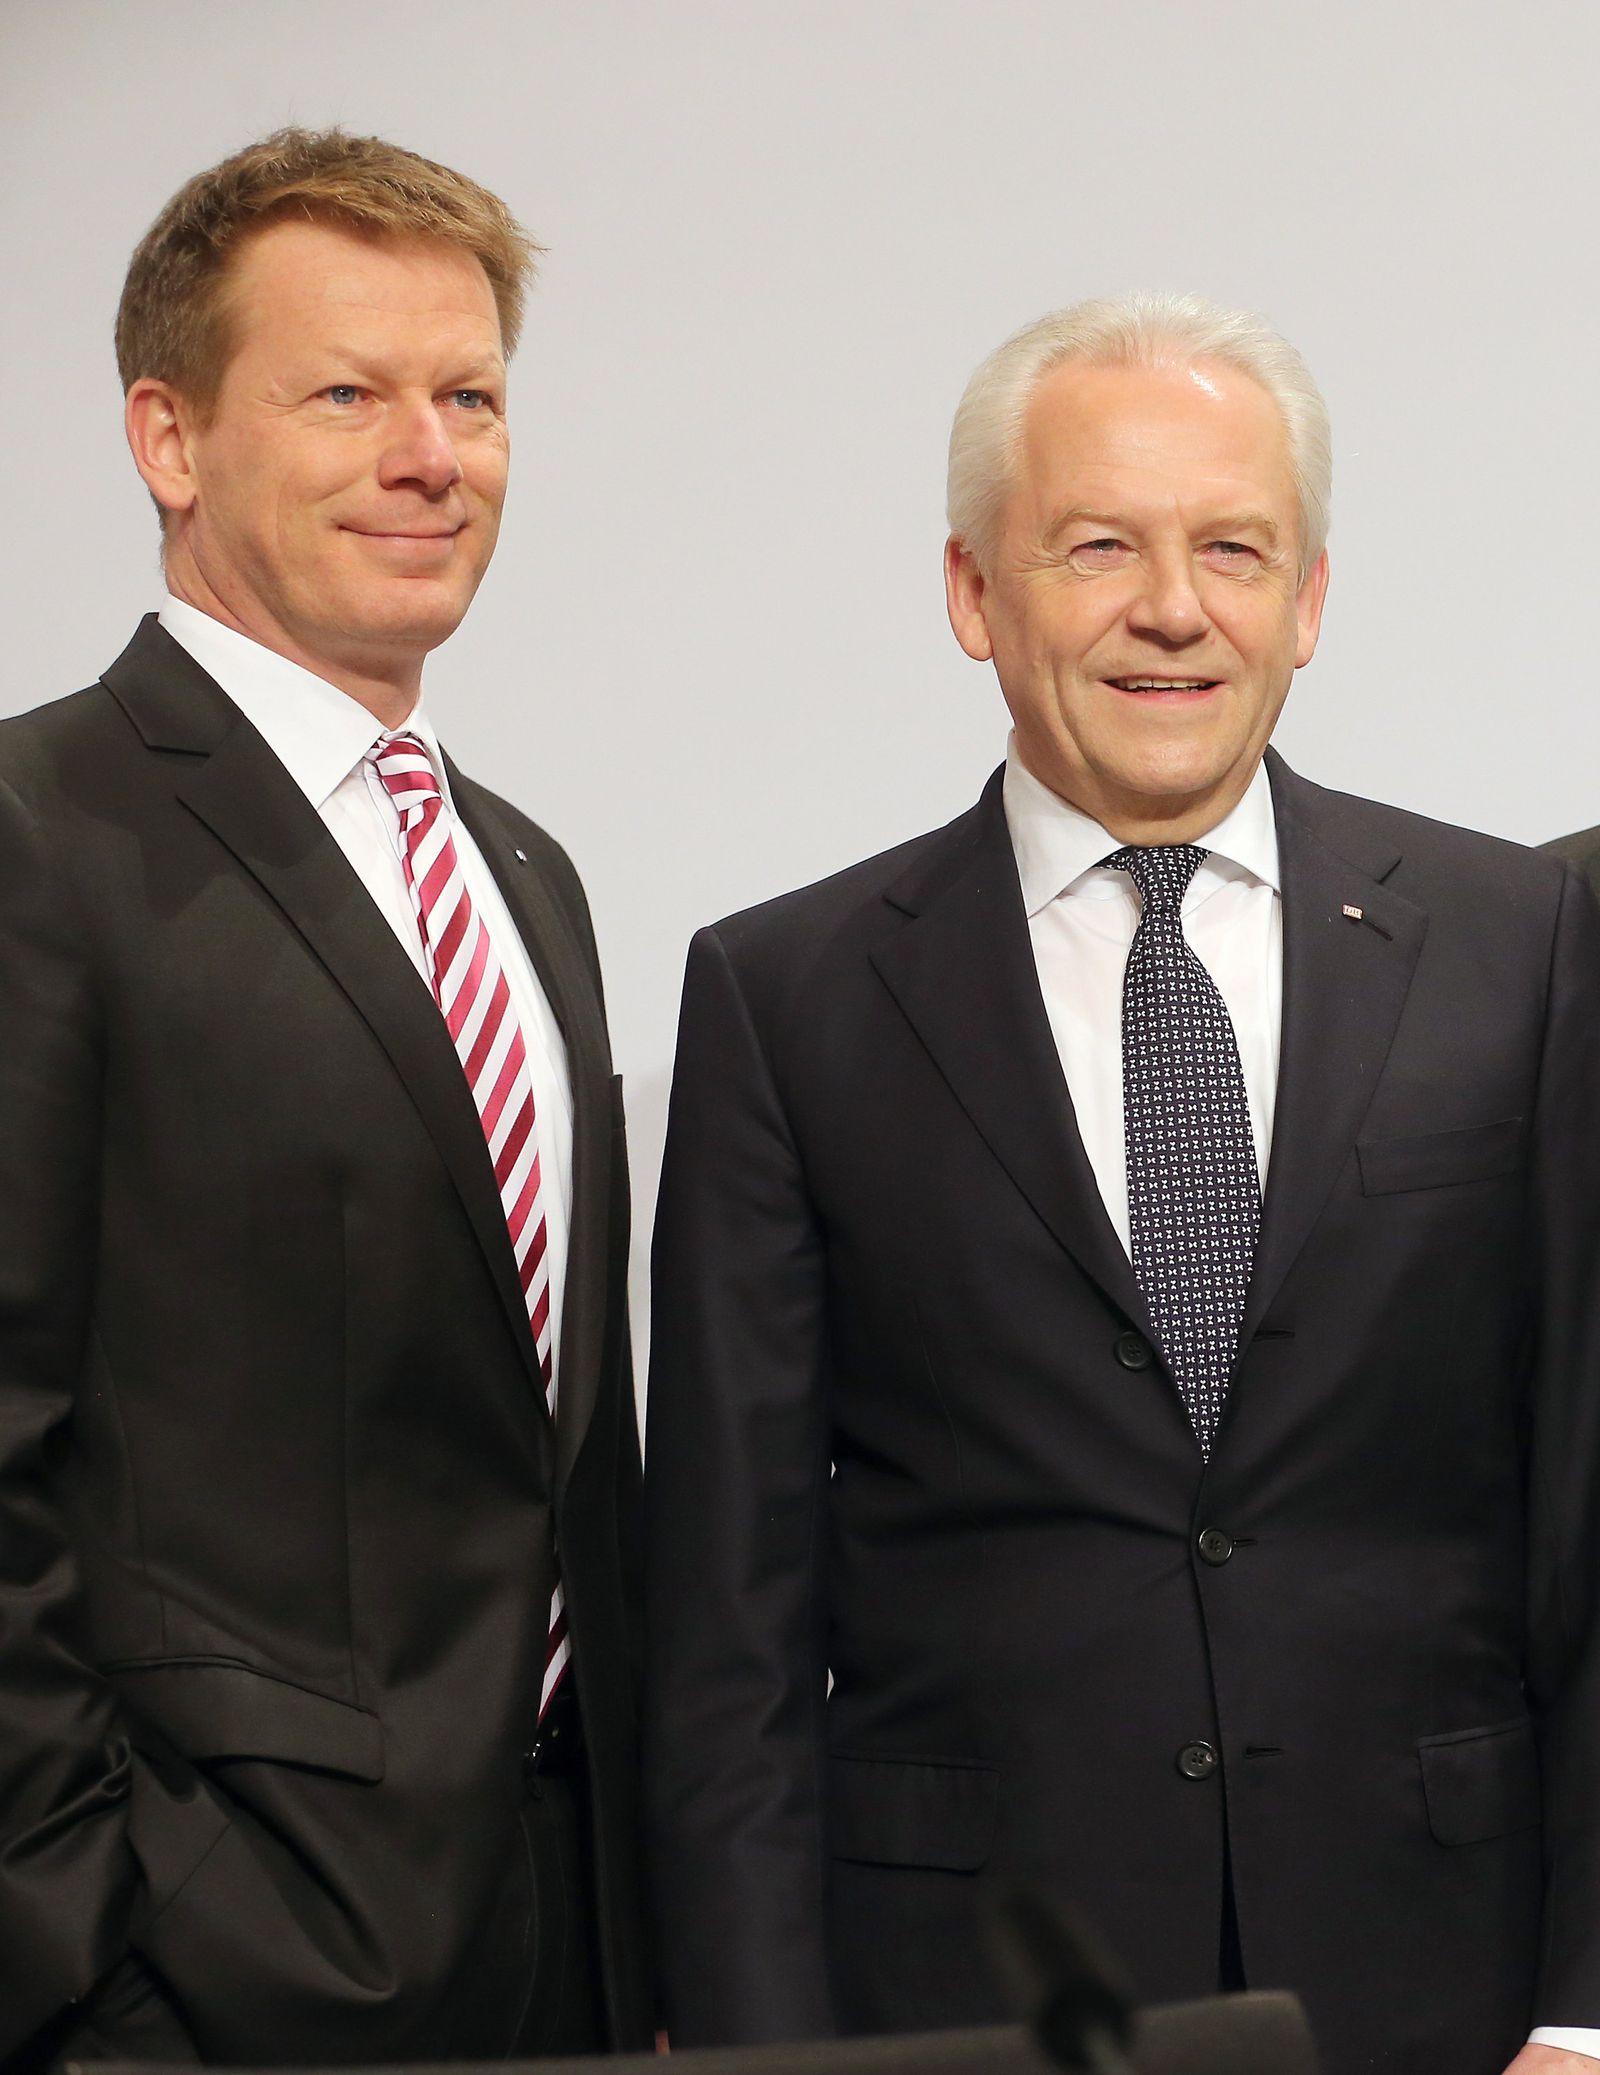 Richard Lutz / Rüdiger Grube